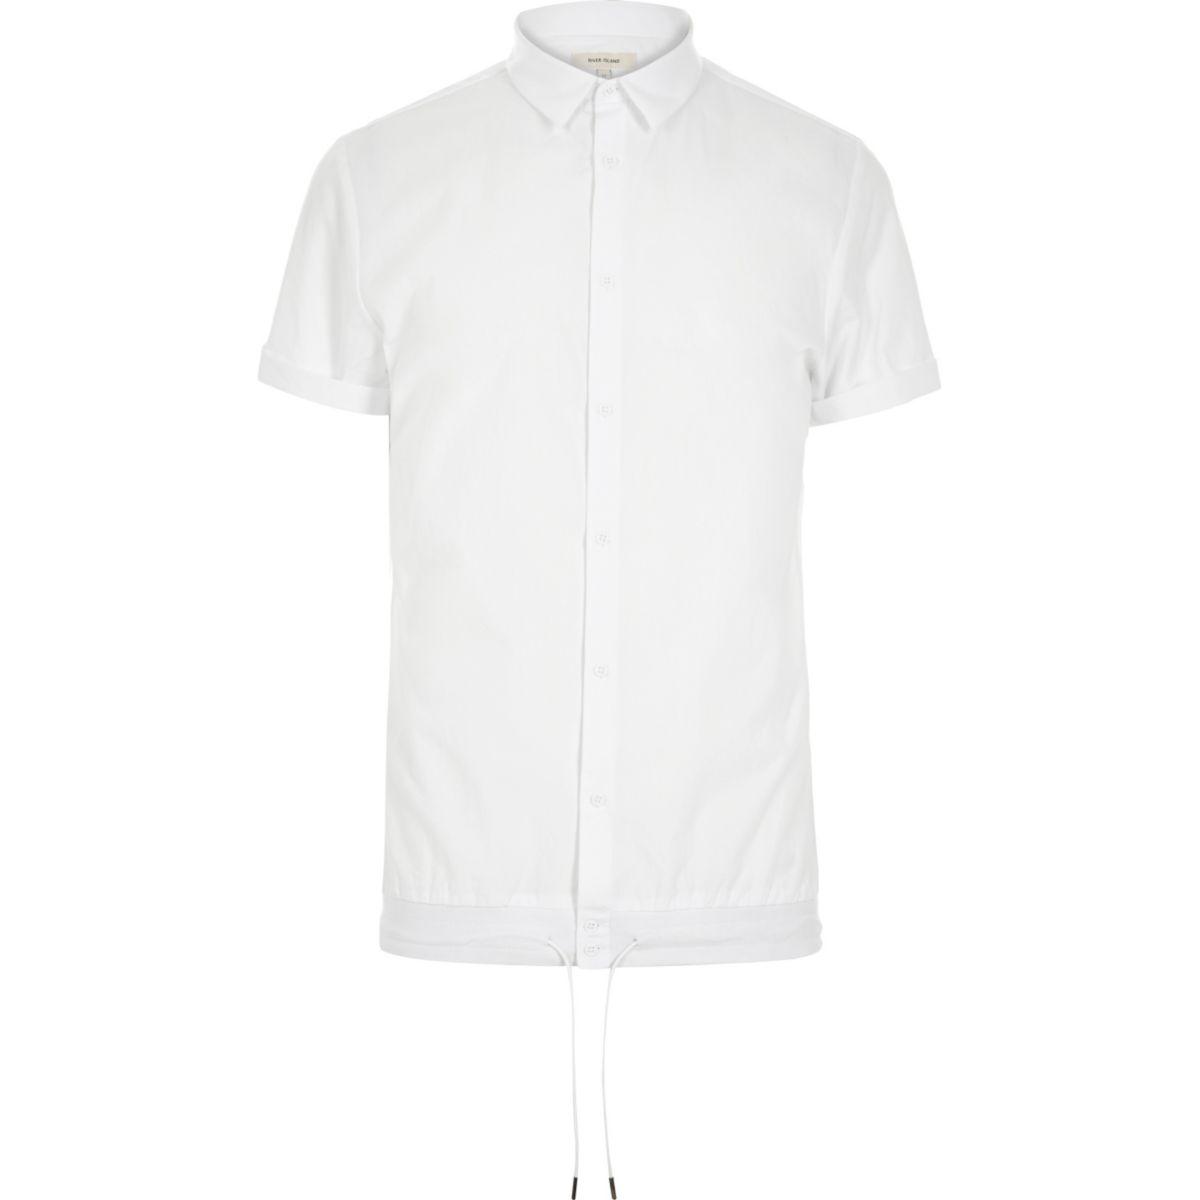 White smart drawstring hem short sleeve shirt